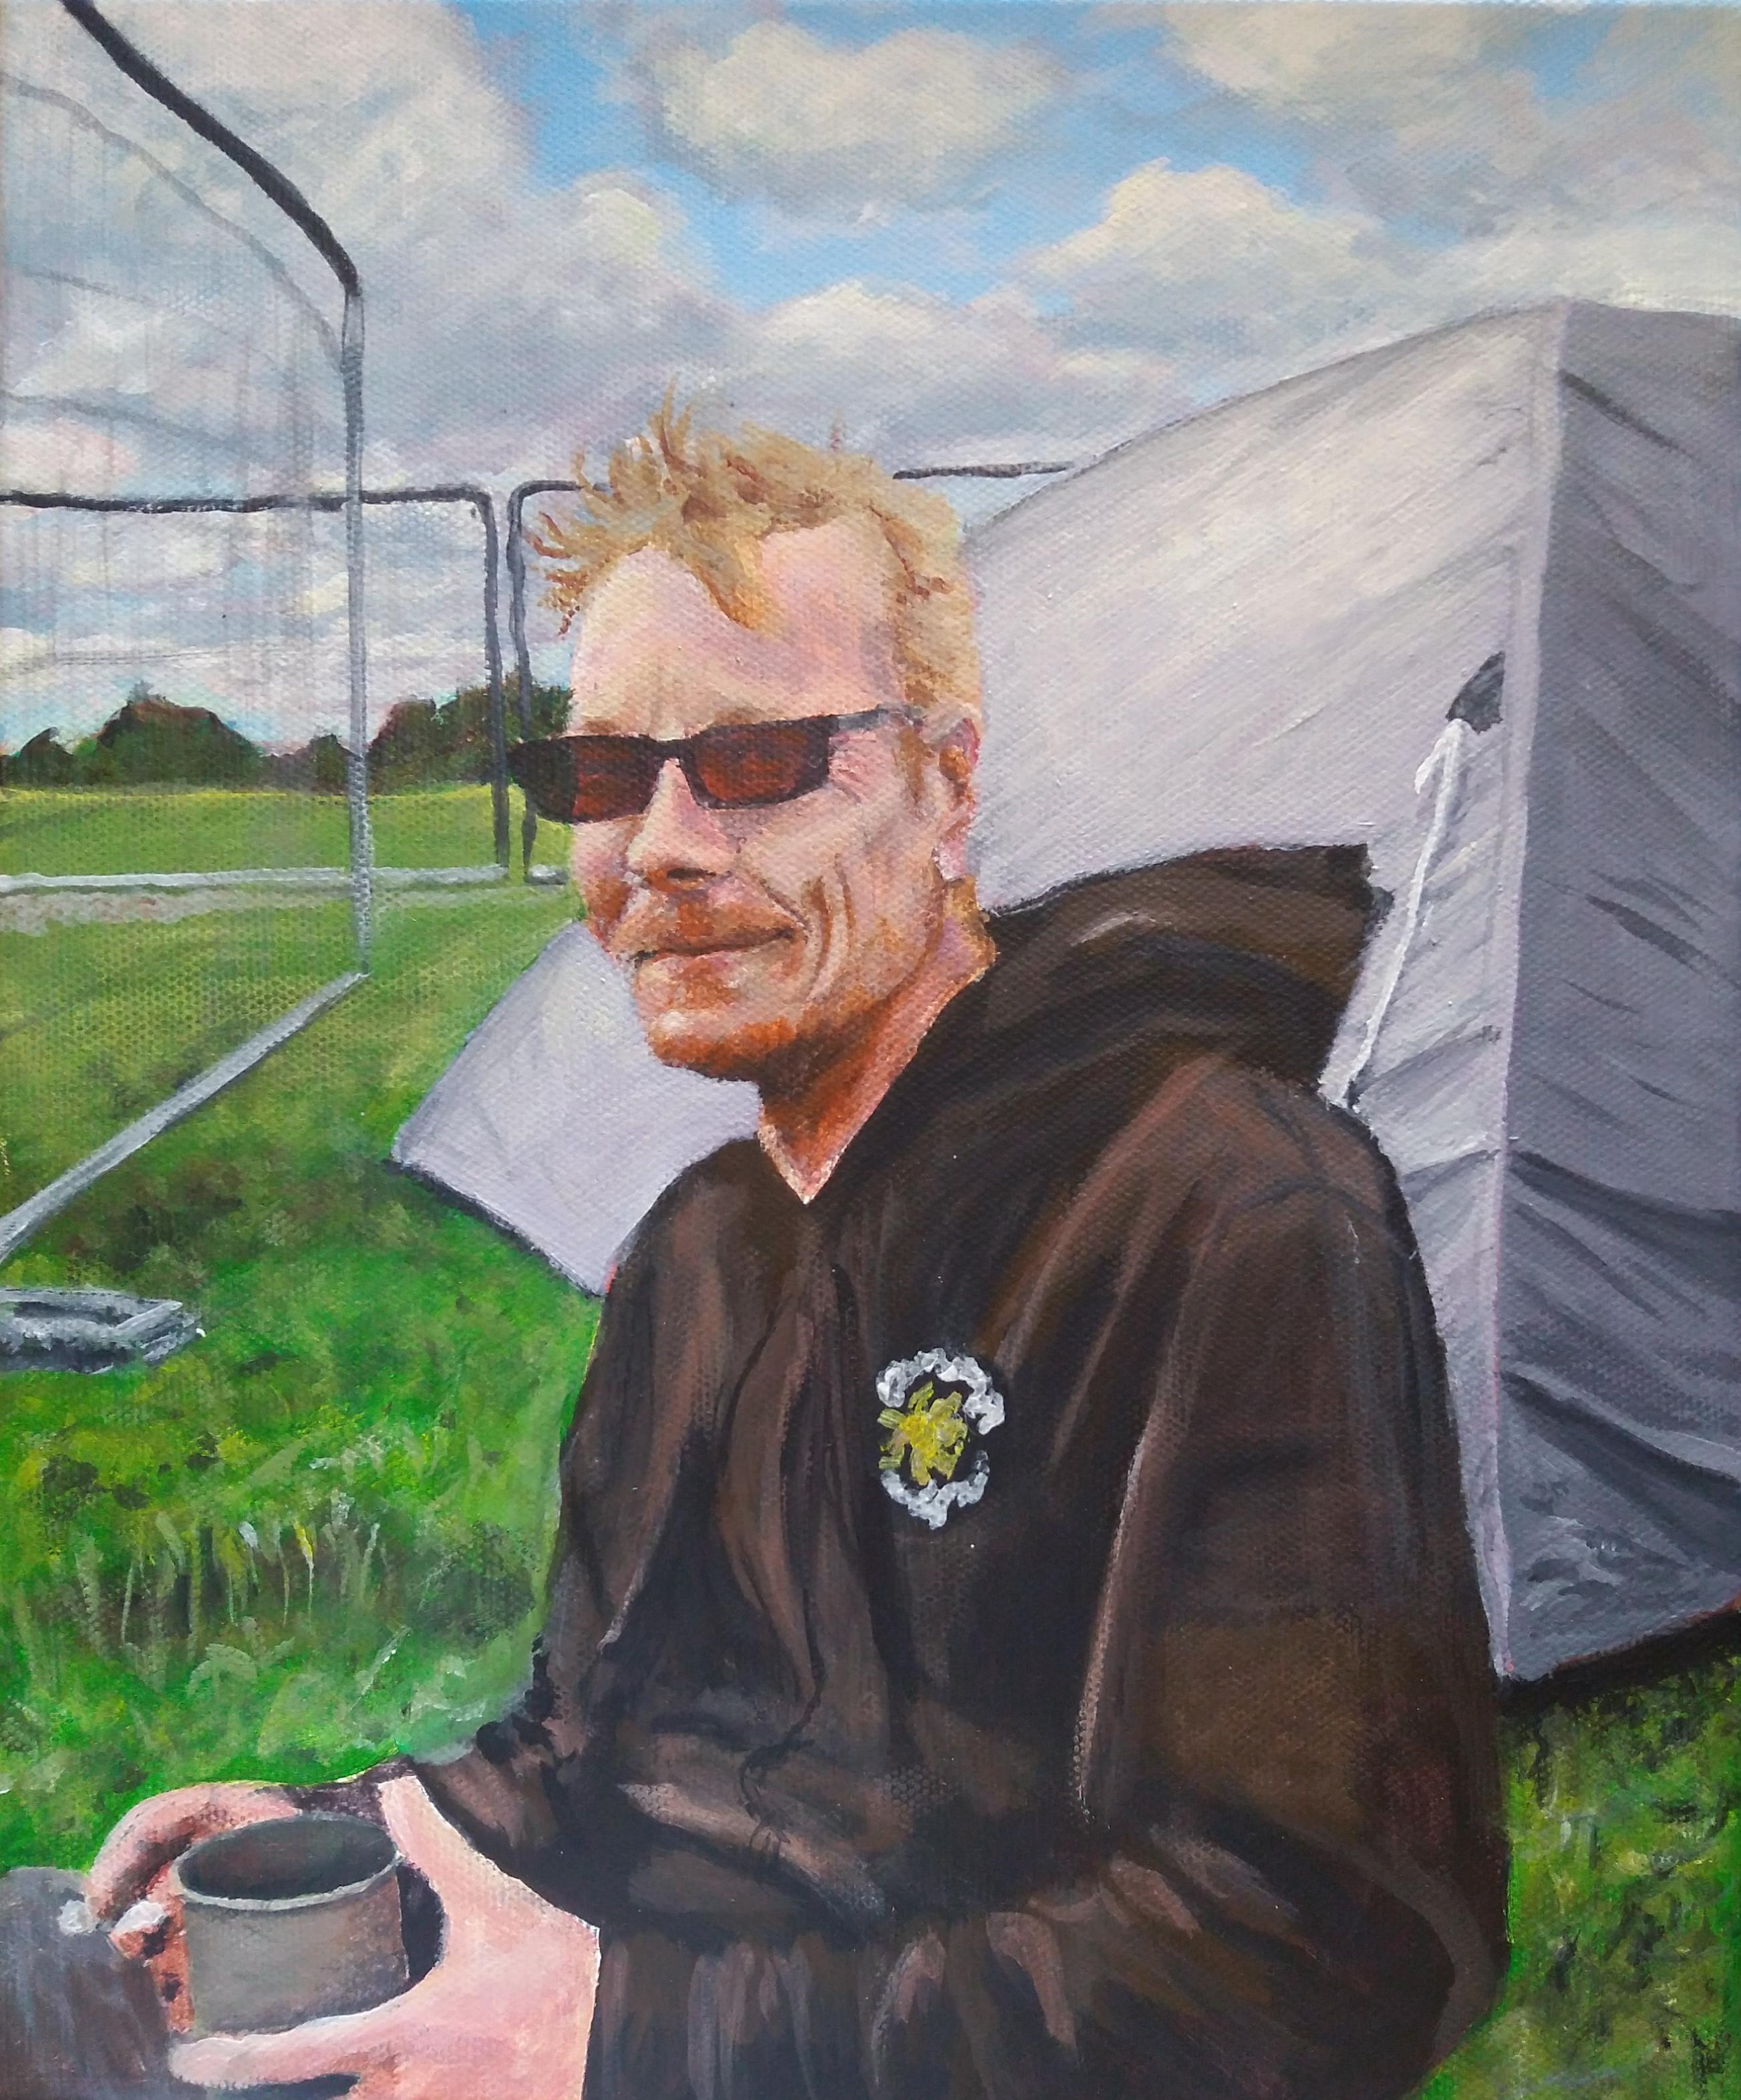 Crispian Baker, 1972-2015